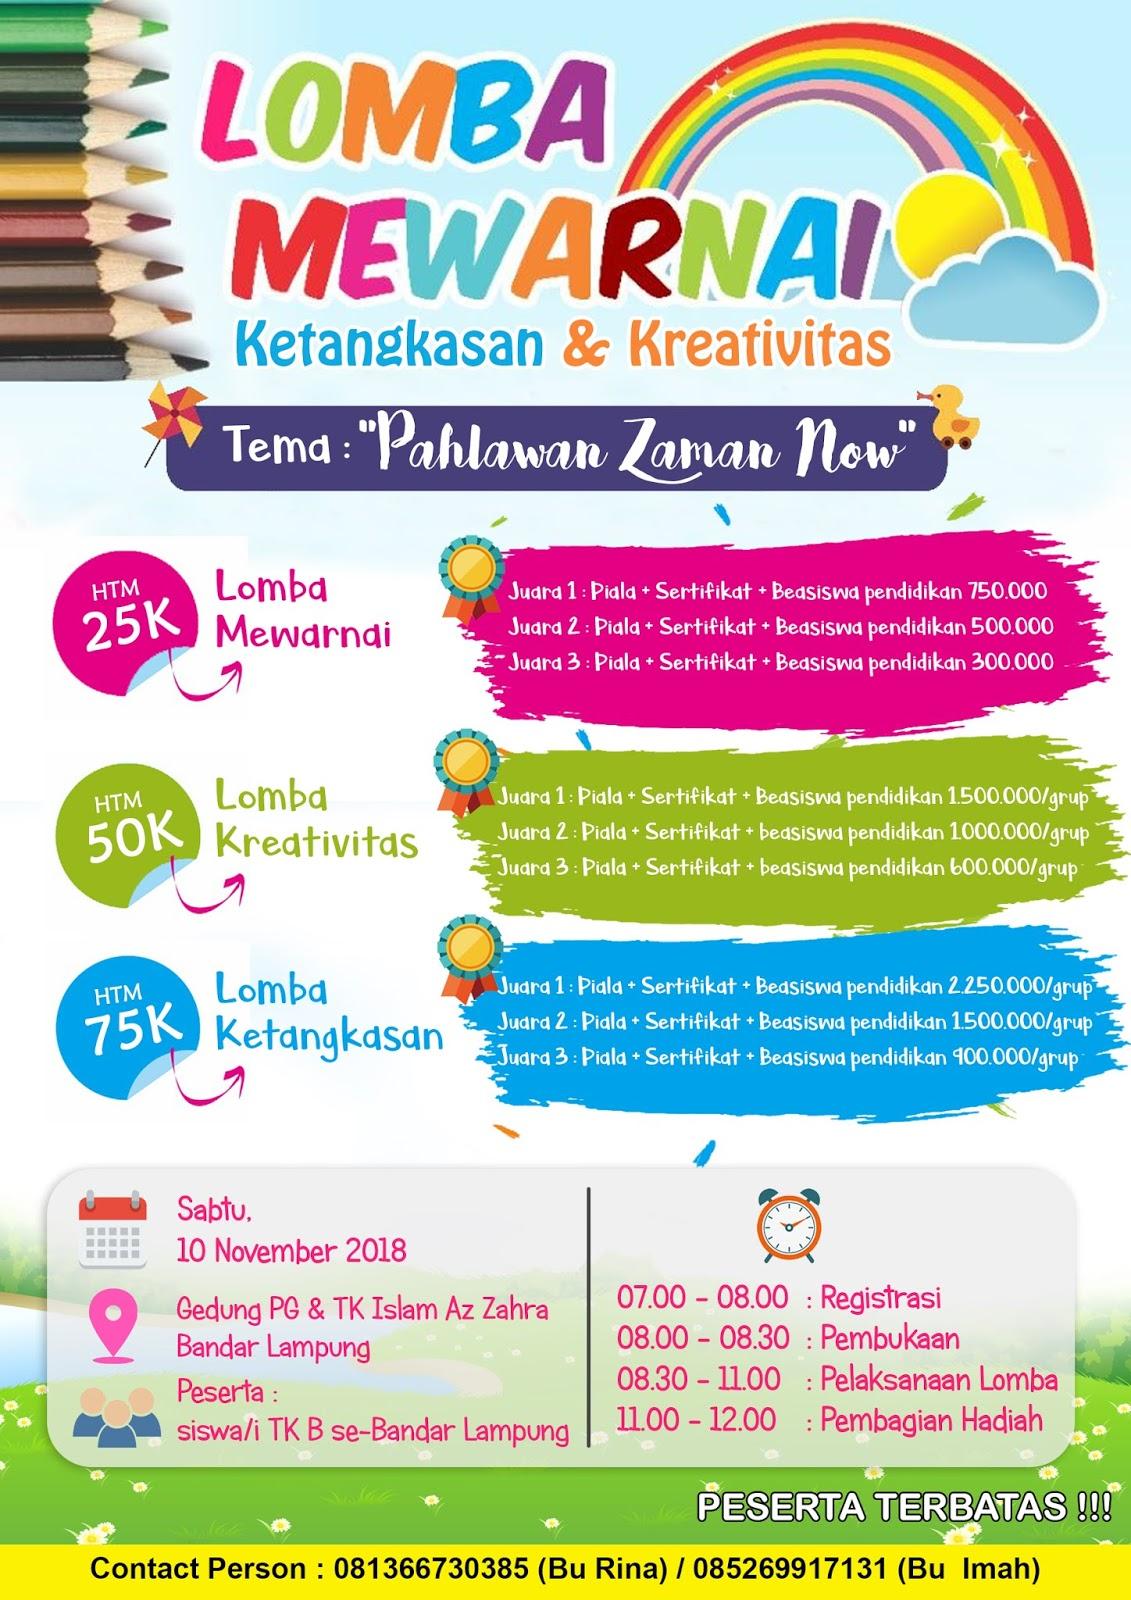 Yayasan Fatimah Az Zahra Lampung